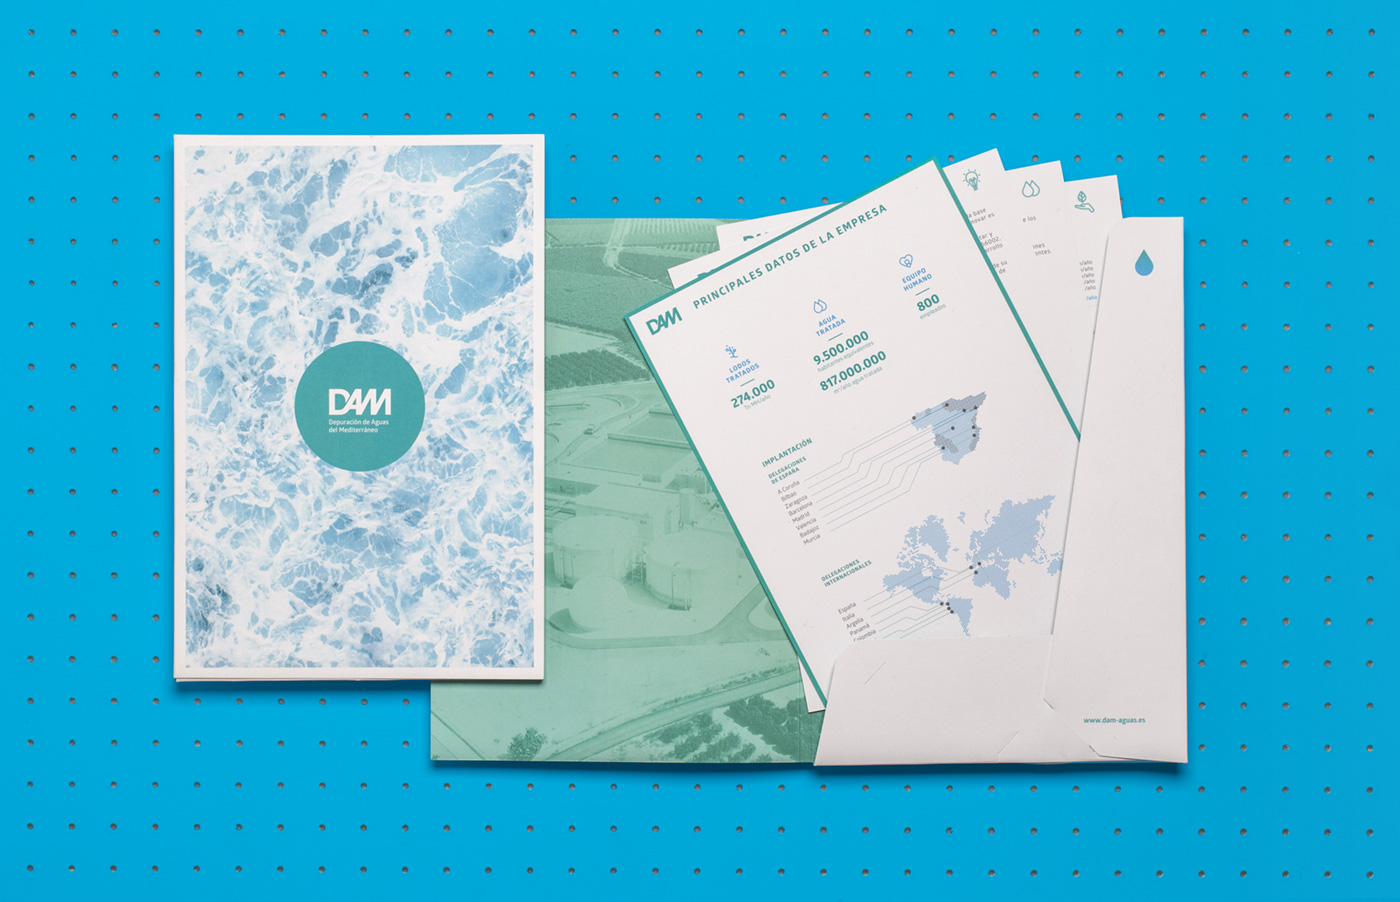 pixelarte-diseno-grafico-papeleria-informes-Dam_Depuracion_Aguas_Mediterraneo